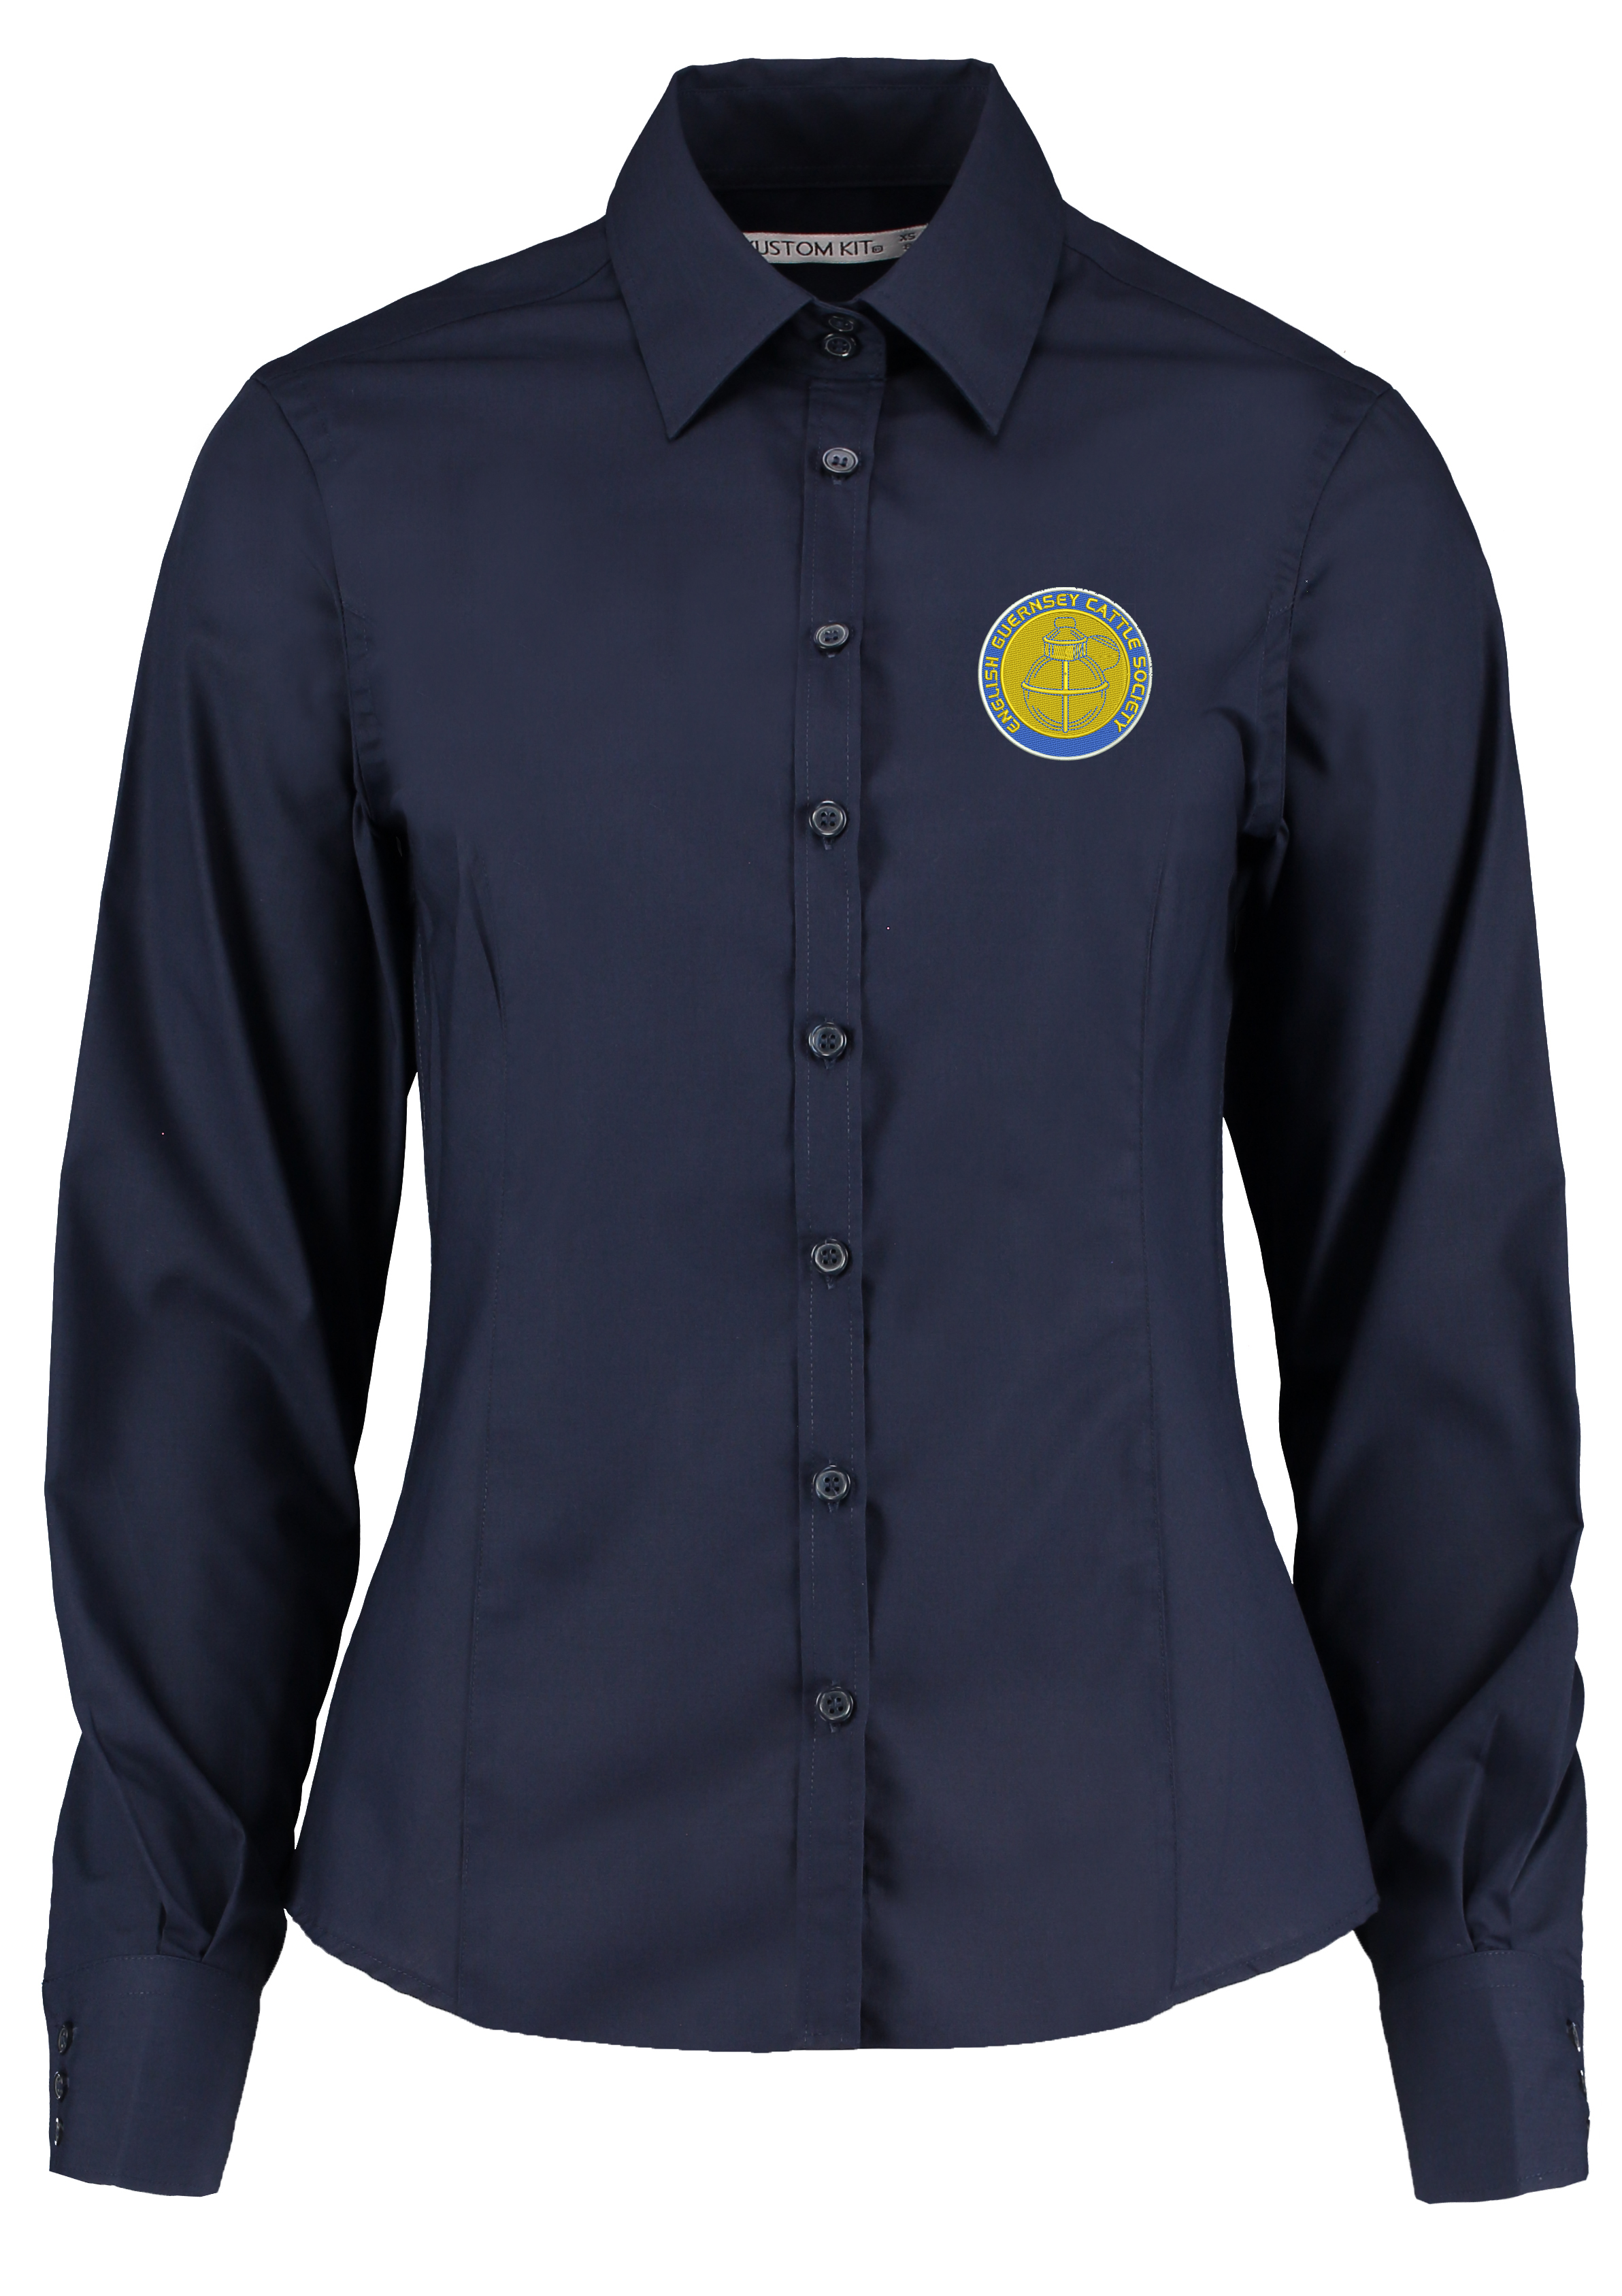 EGCS Ladies Long Sleeved Shirt